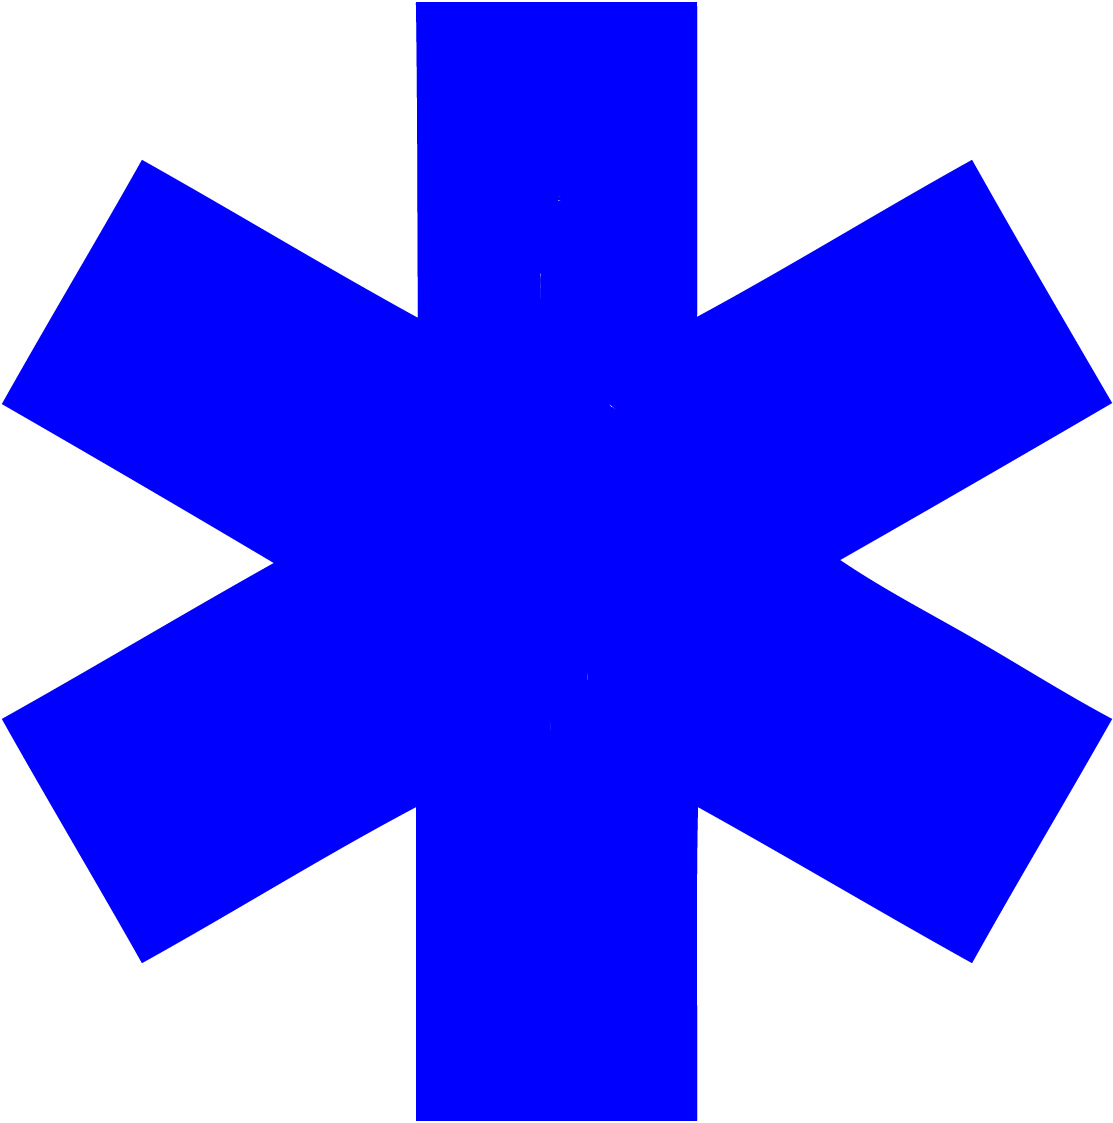 paramedic 20clipart clipart panda free clipart images paramedic logo image paramedic logo with a skull